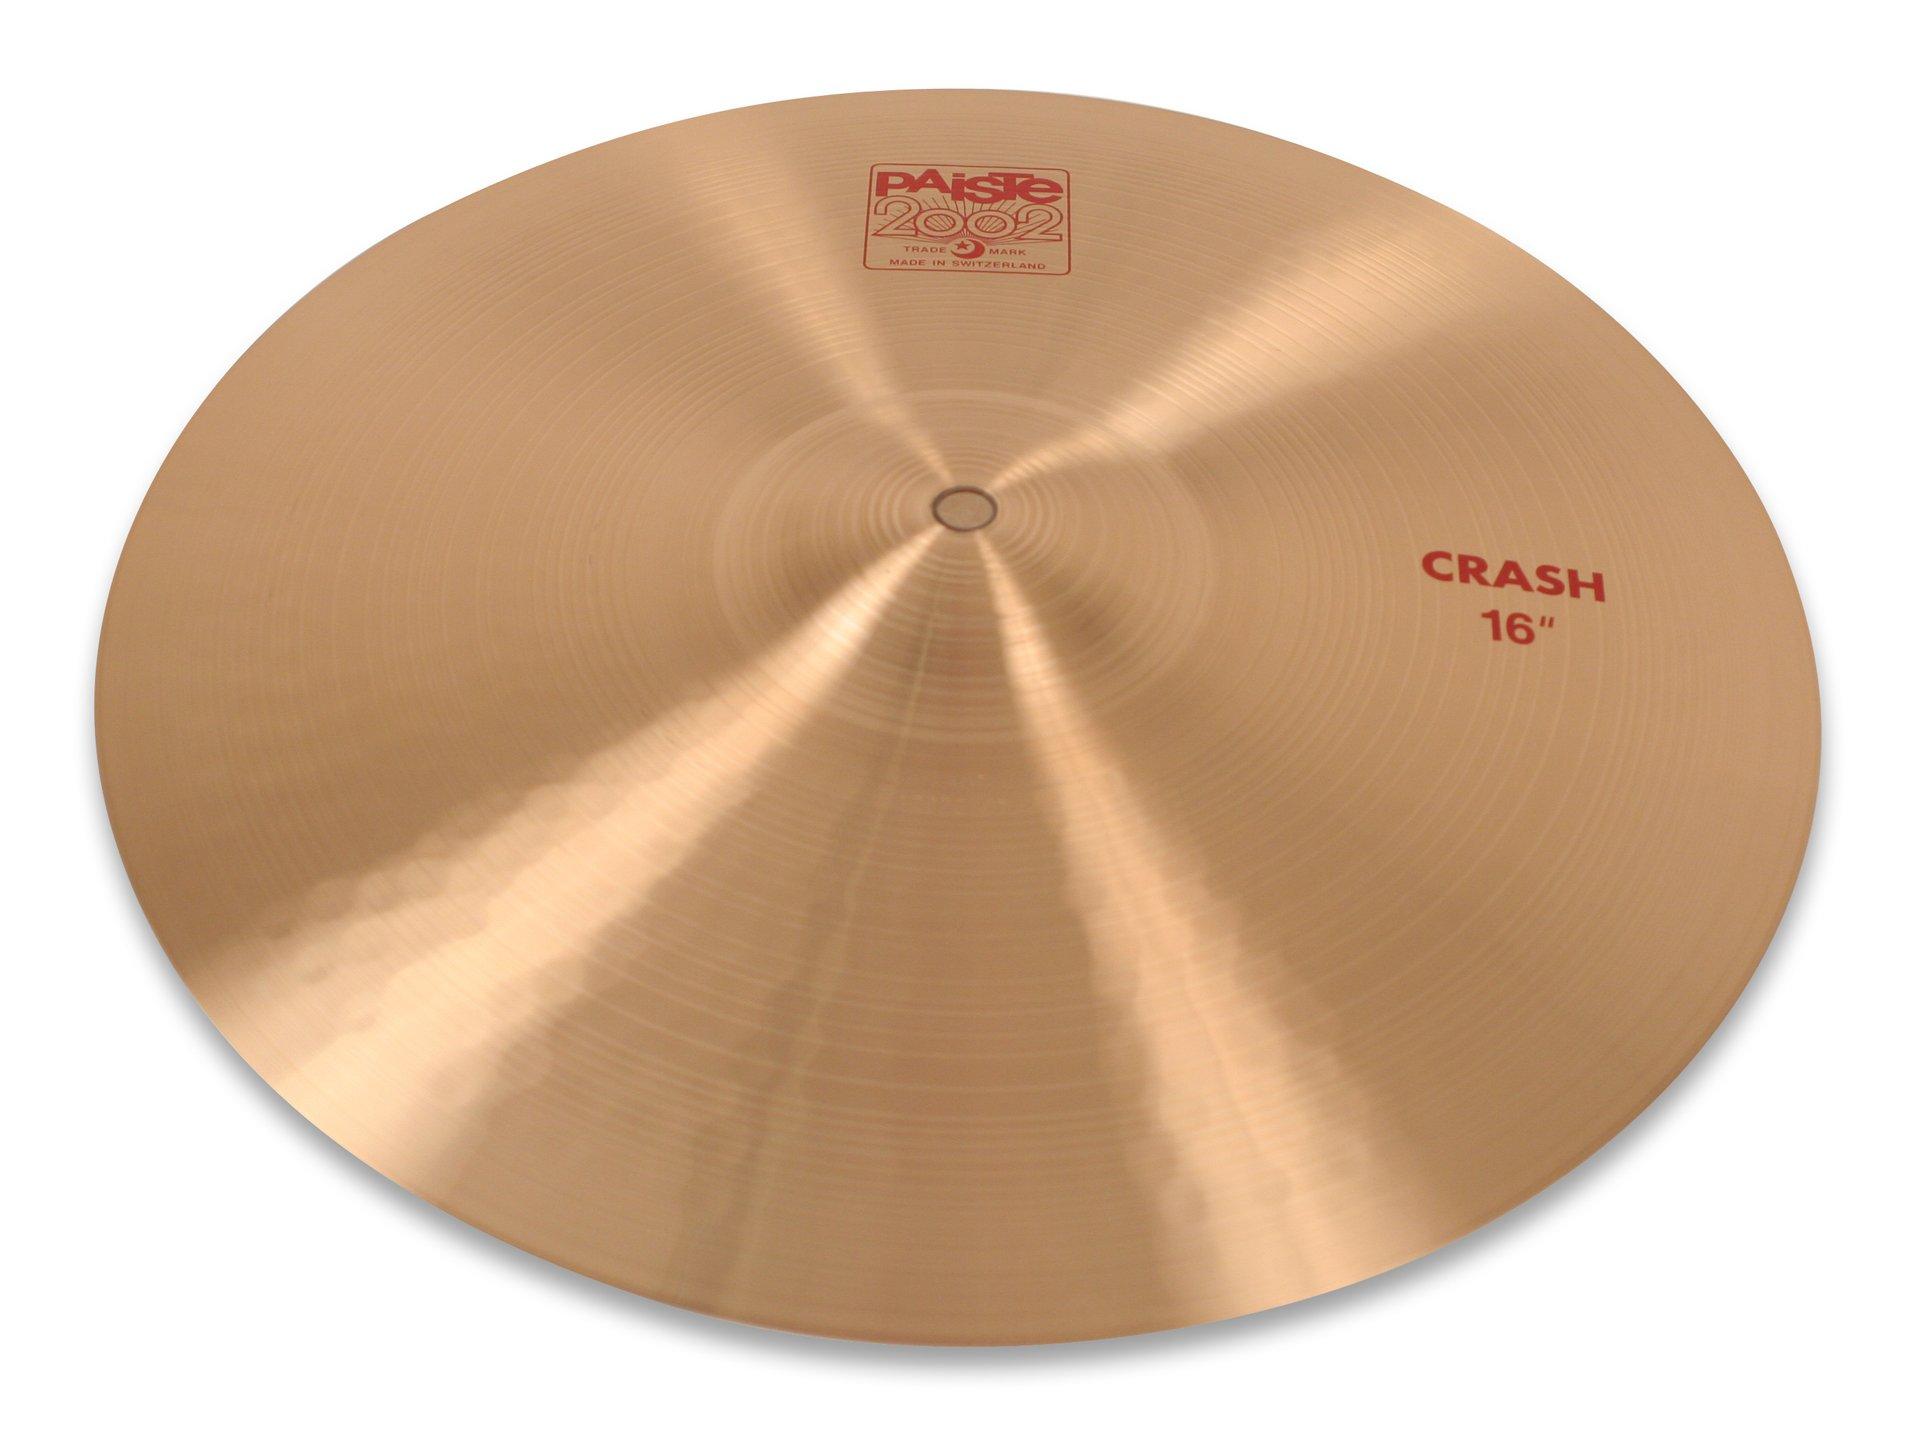 Paiste 2002 Classic Cymbal Crash 16-inch by Paiste